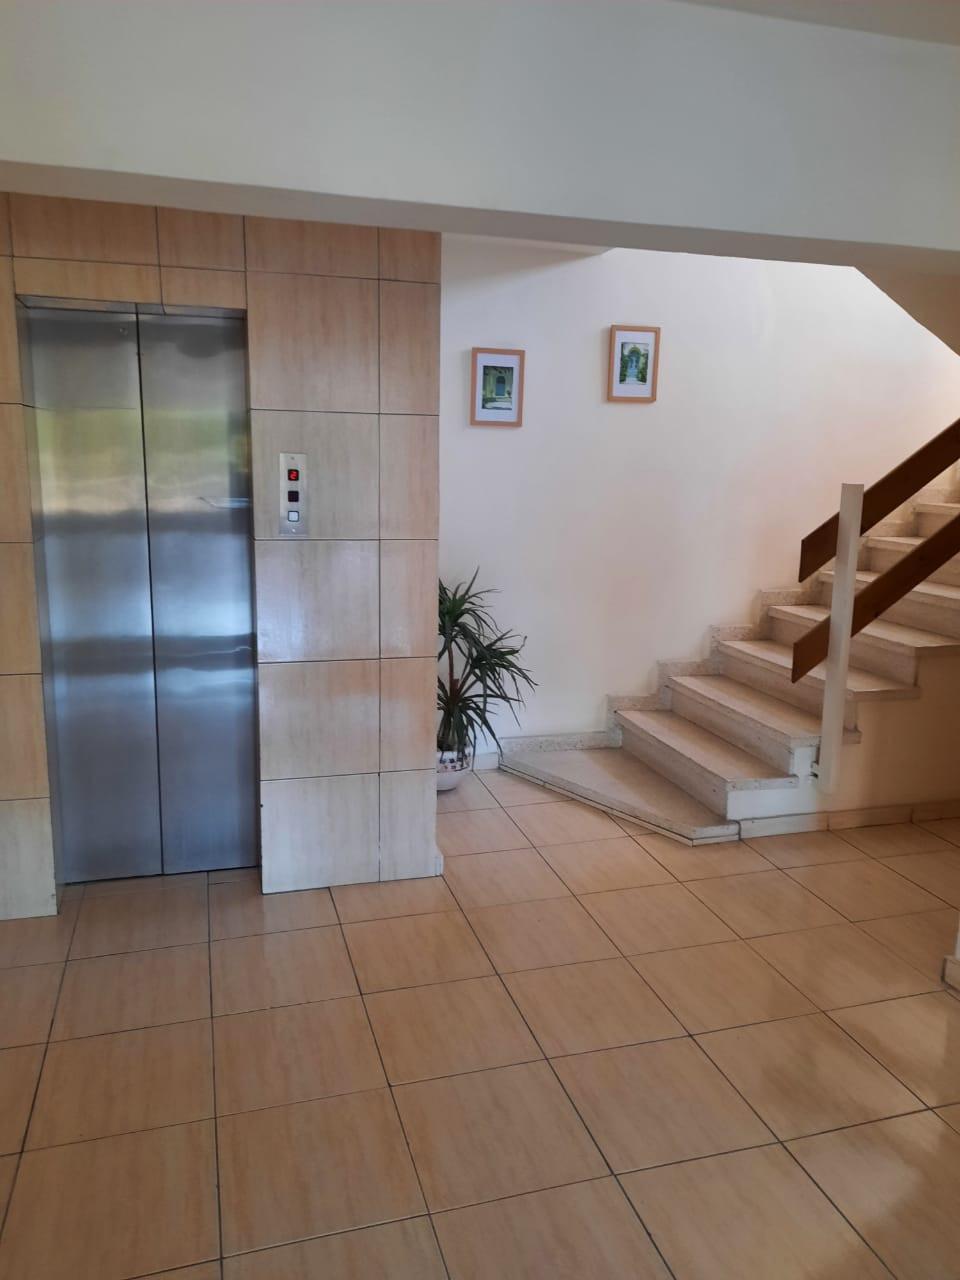 FC-33497: Apartment (Flat) in Mackenzie, Larnaca for Sale - #15